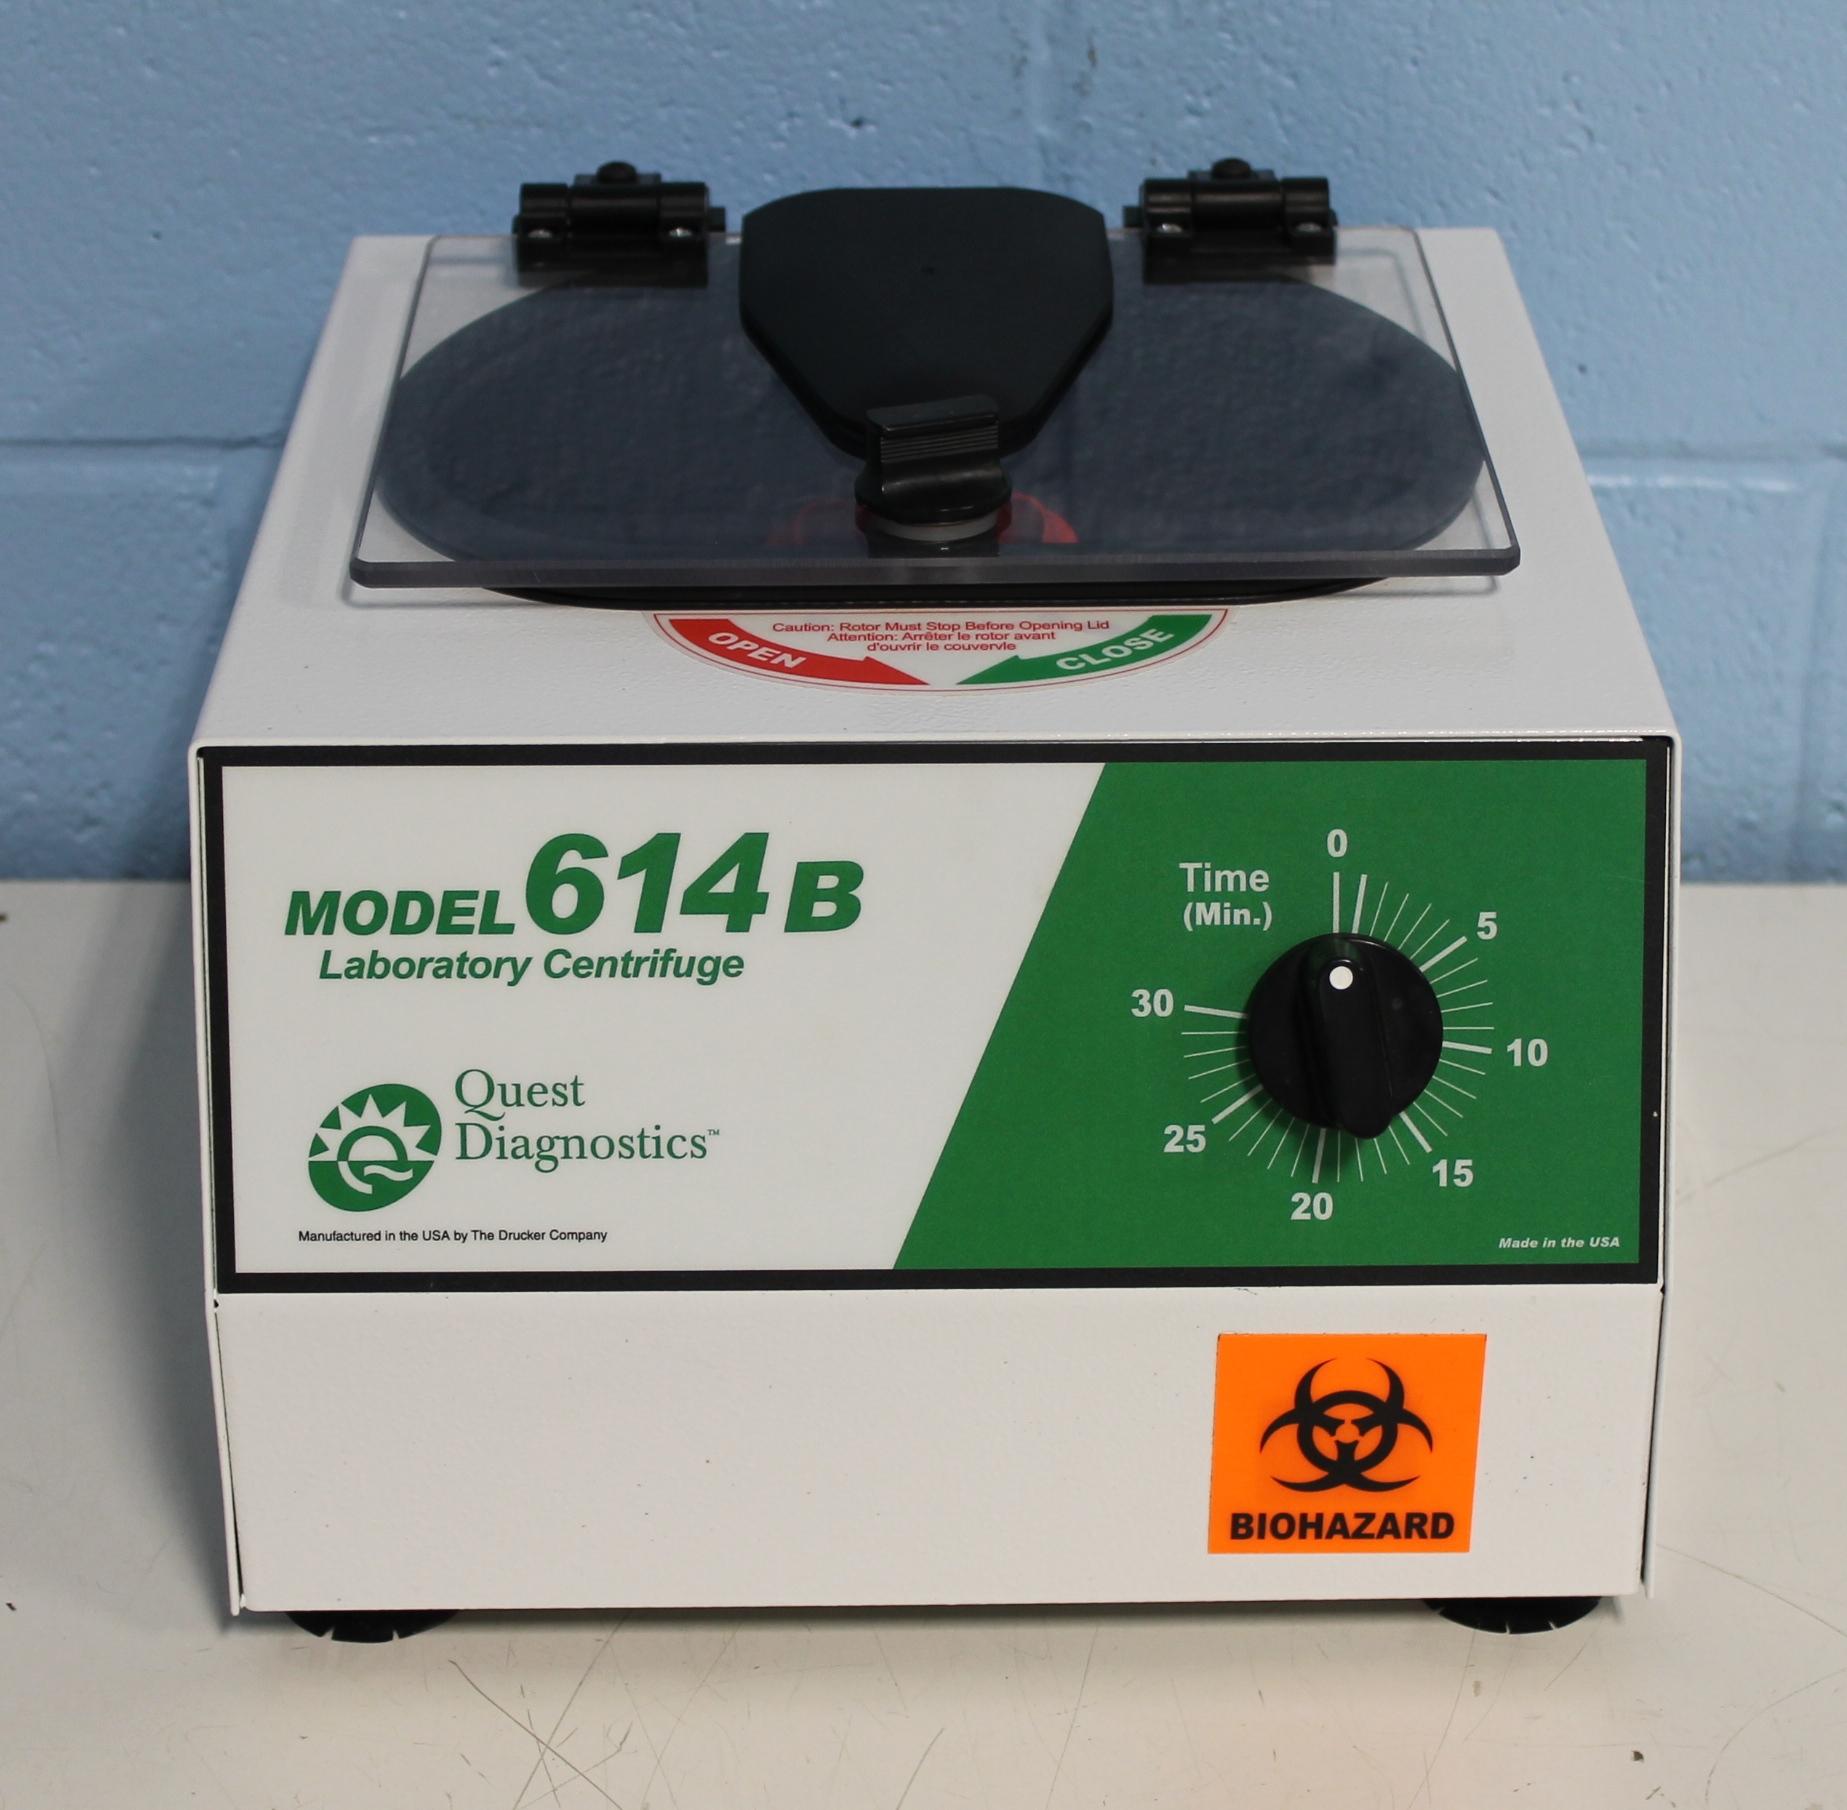 Drucker 614B Benchtop Centrifuge Image